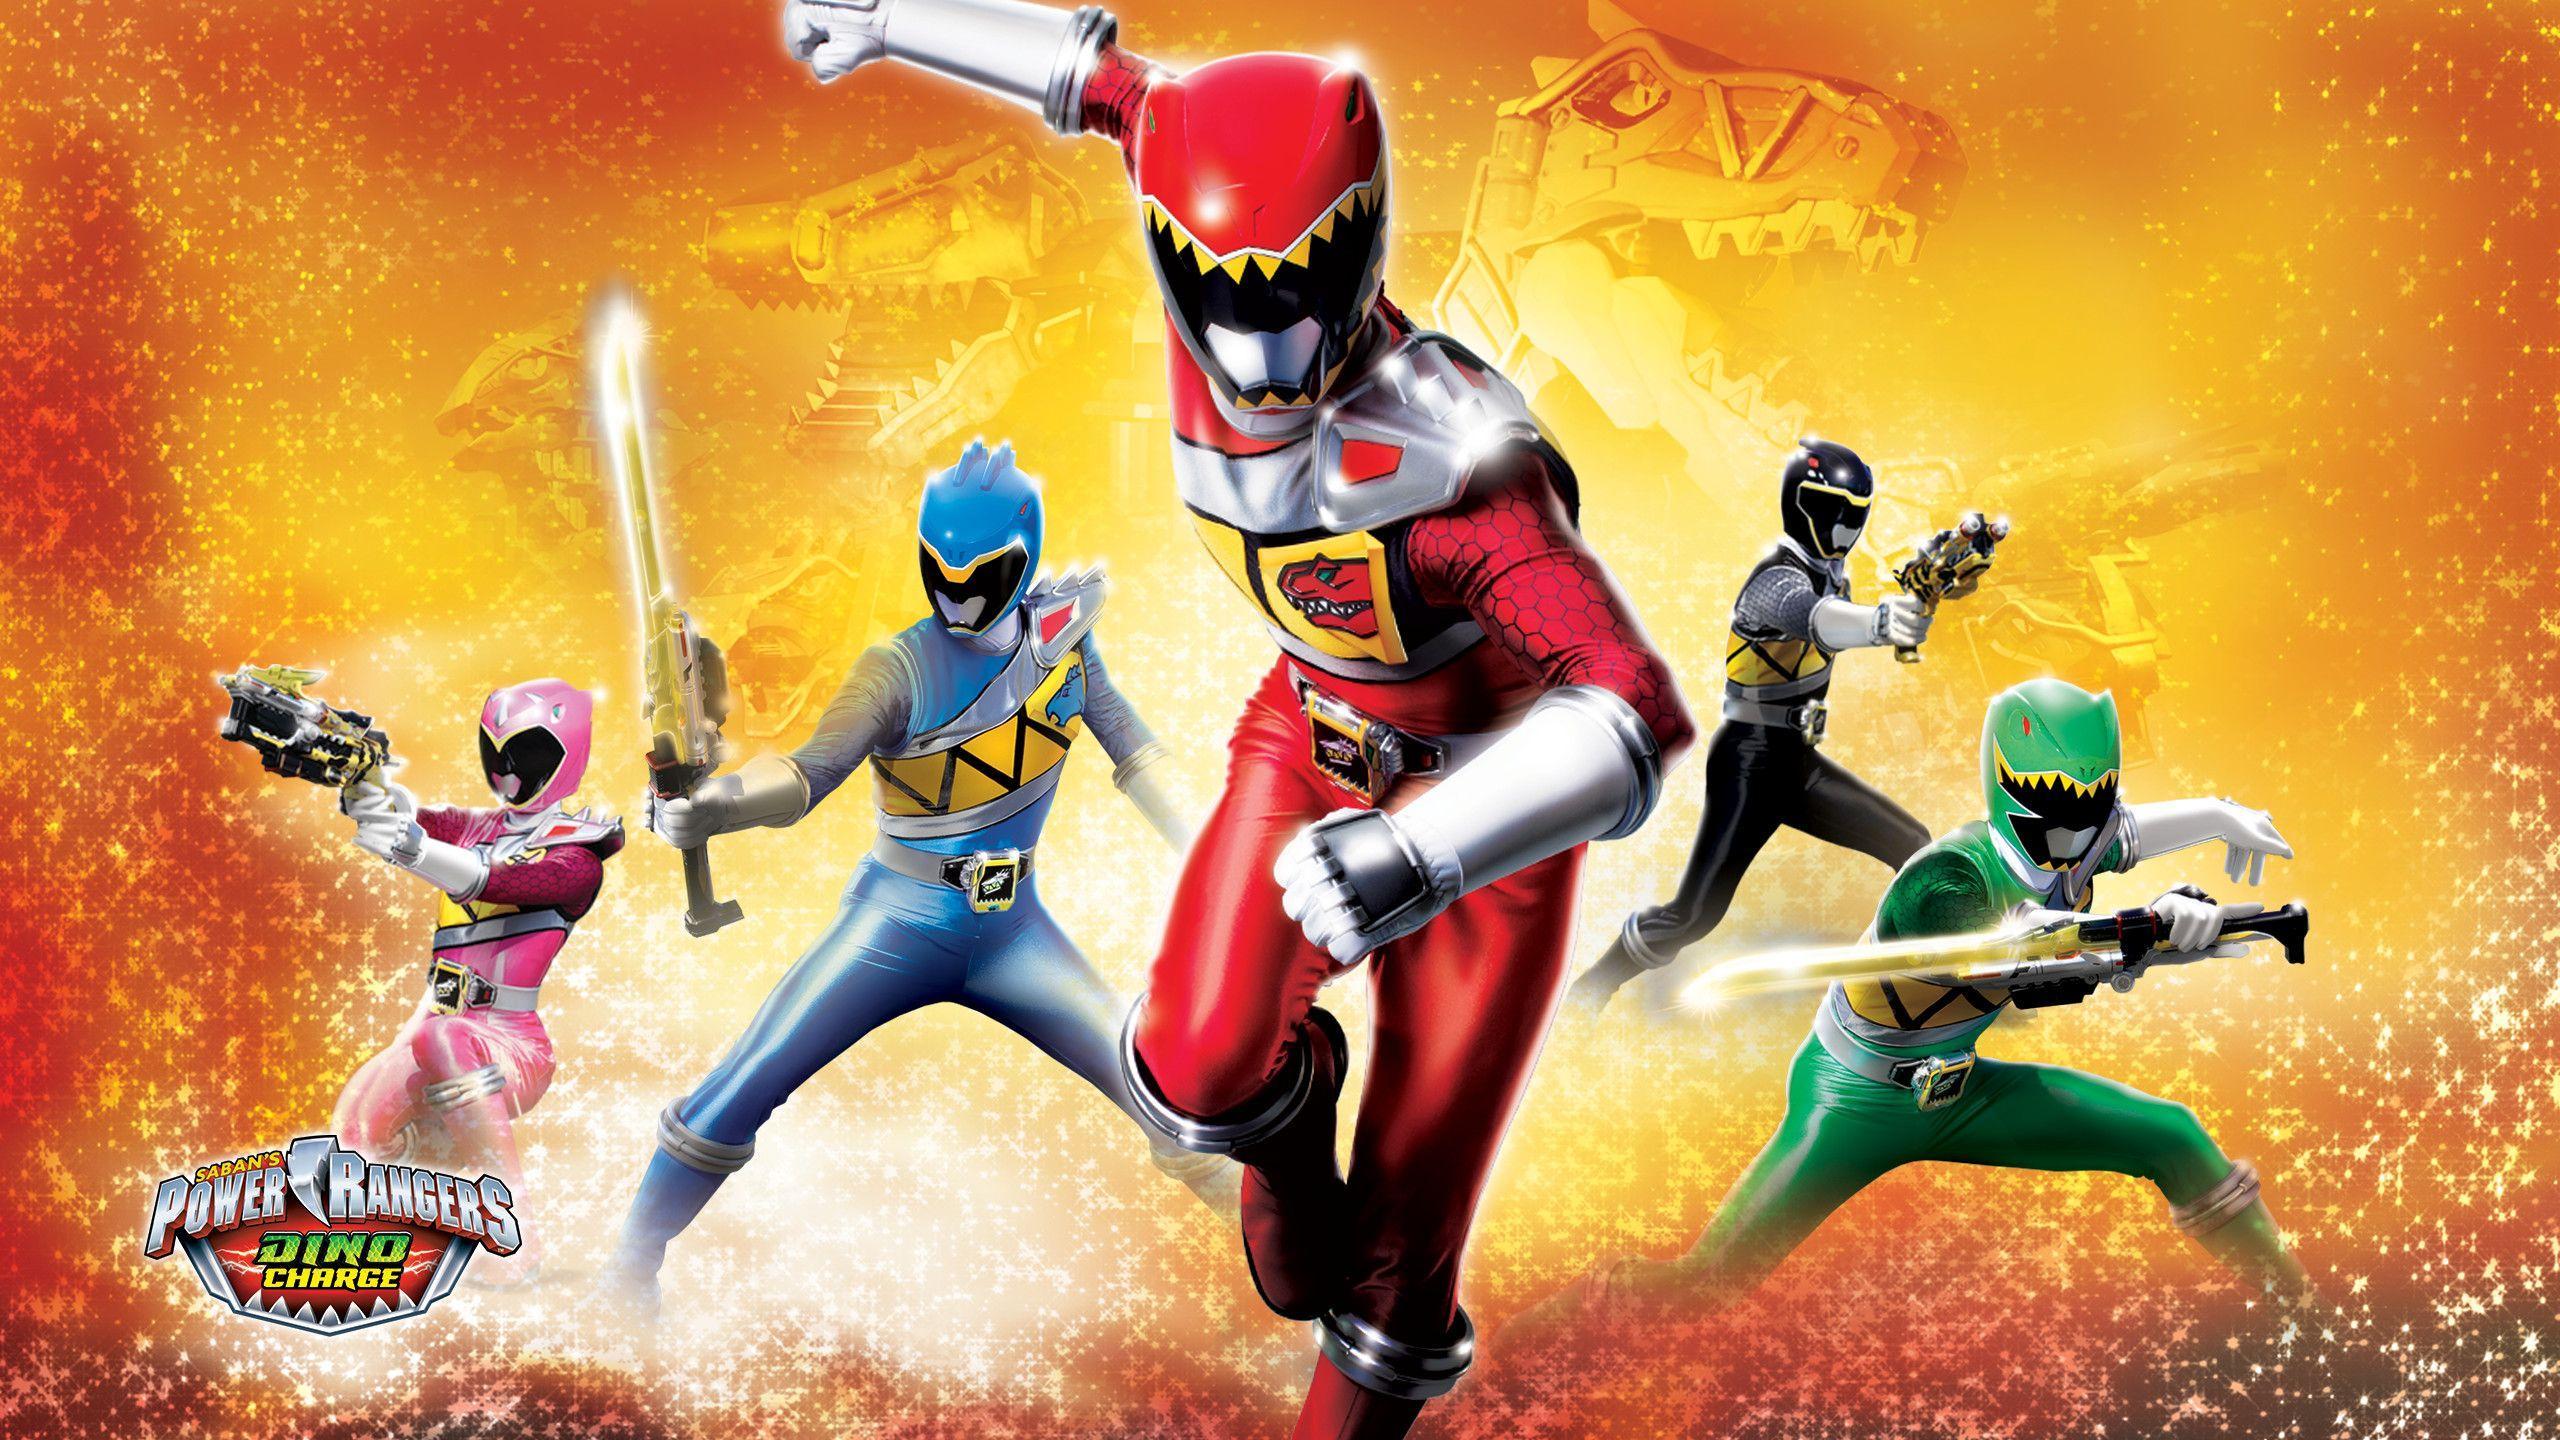 Power Rangers Dino Charge 2